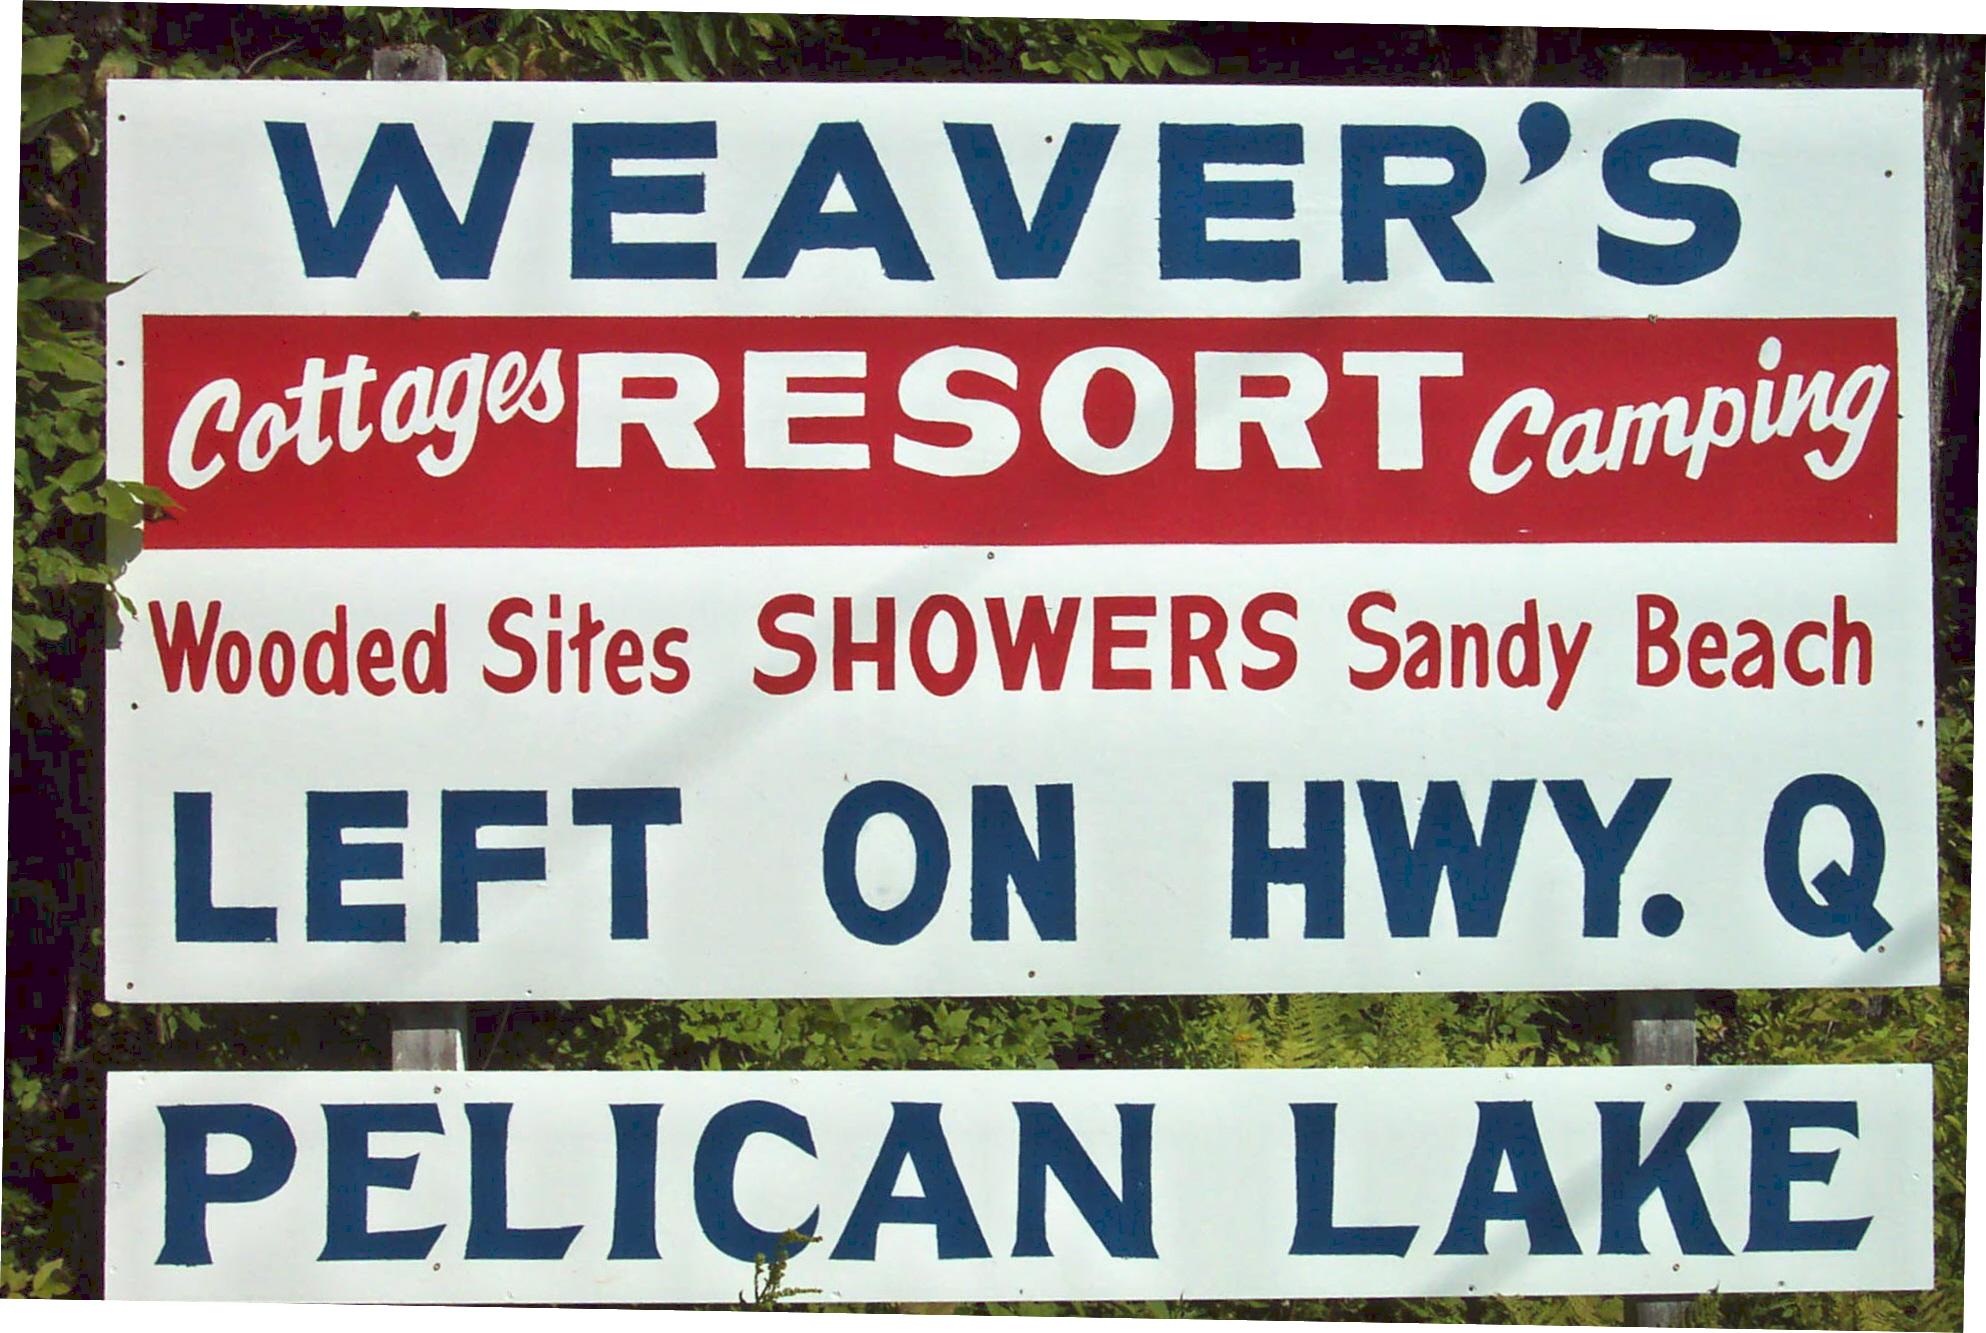 Weaver's Resort & Campground, Pelican Lake WI